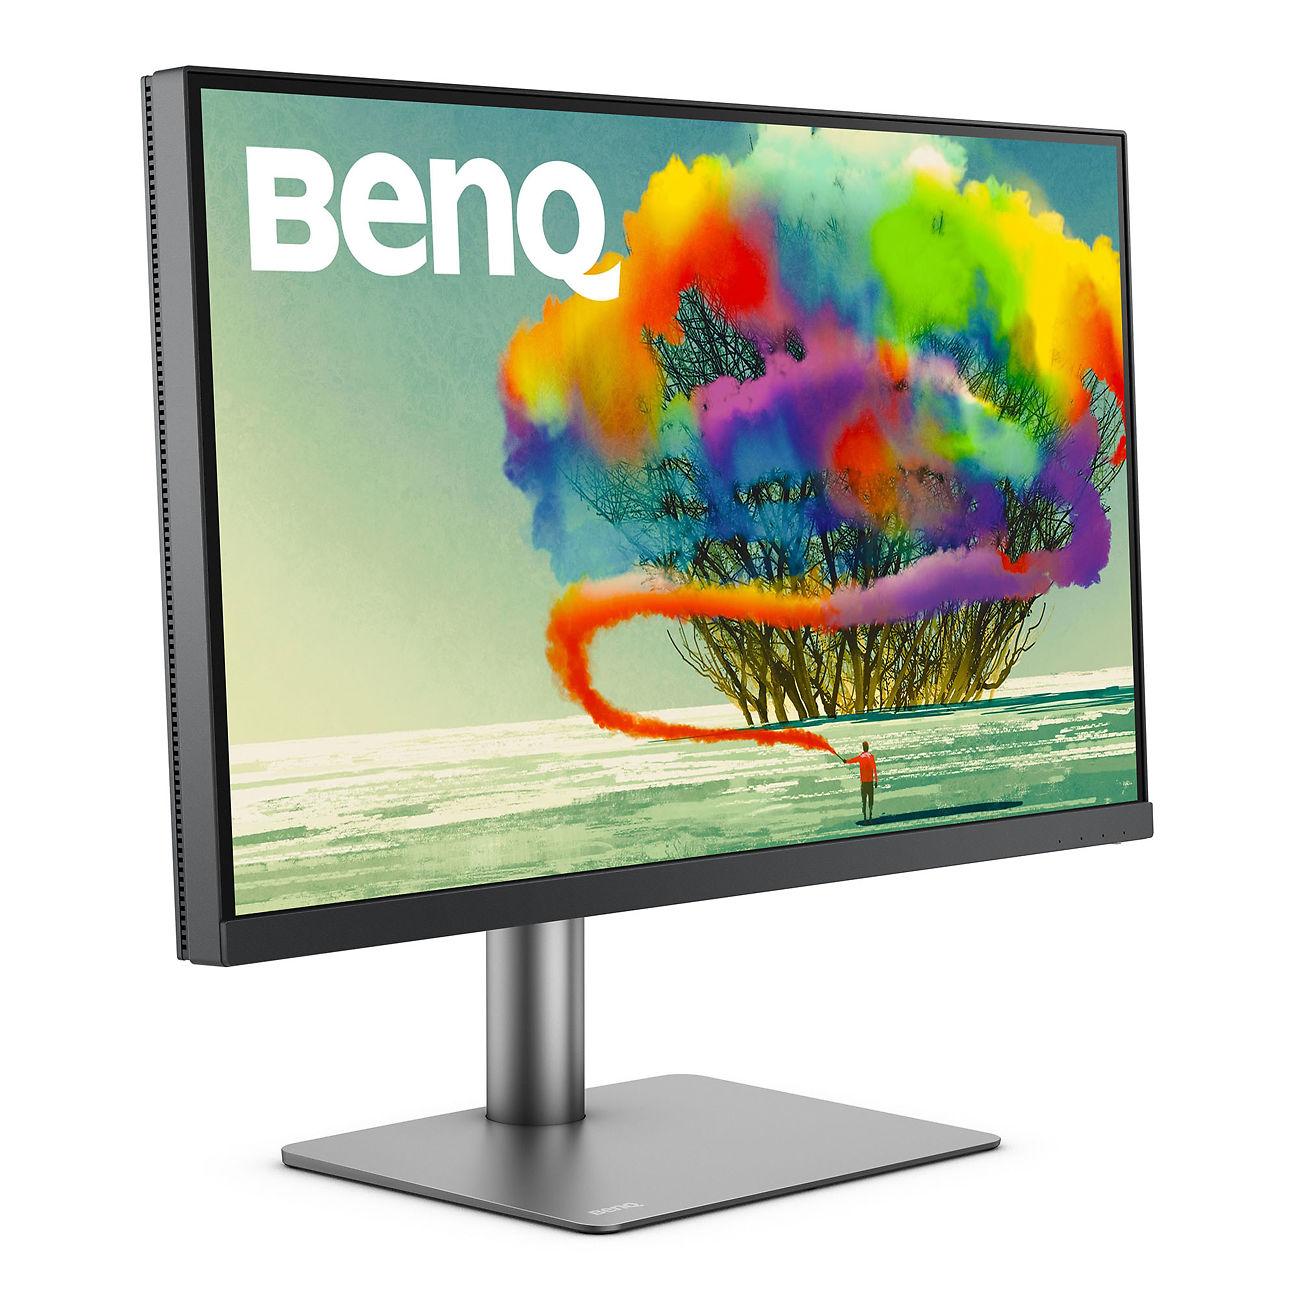 "BenQ PD2720U 27"" 4K UHD Monitor Image"